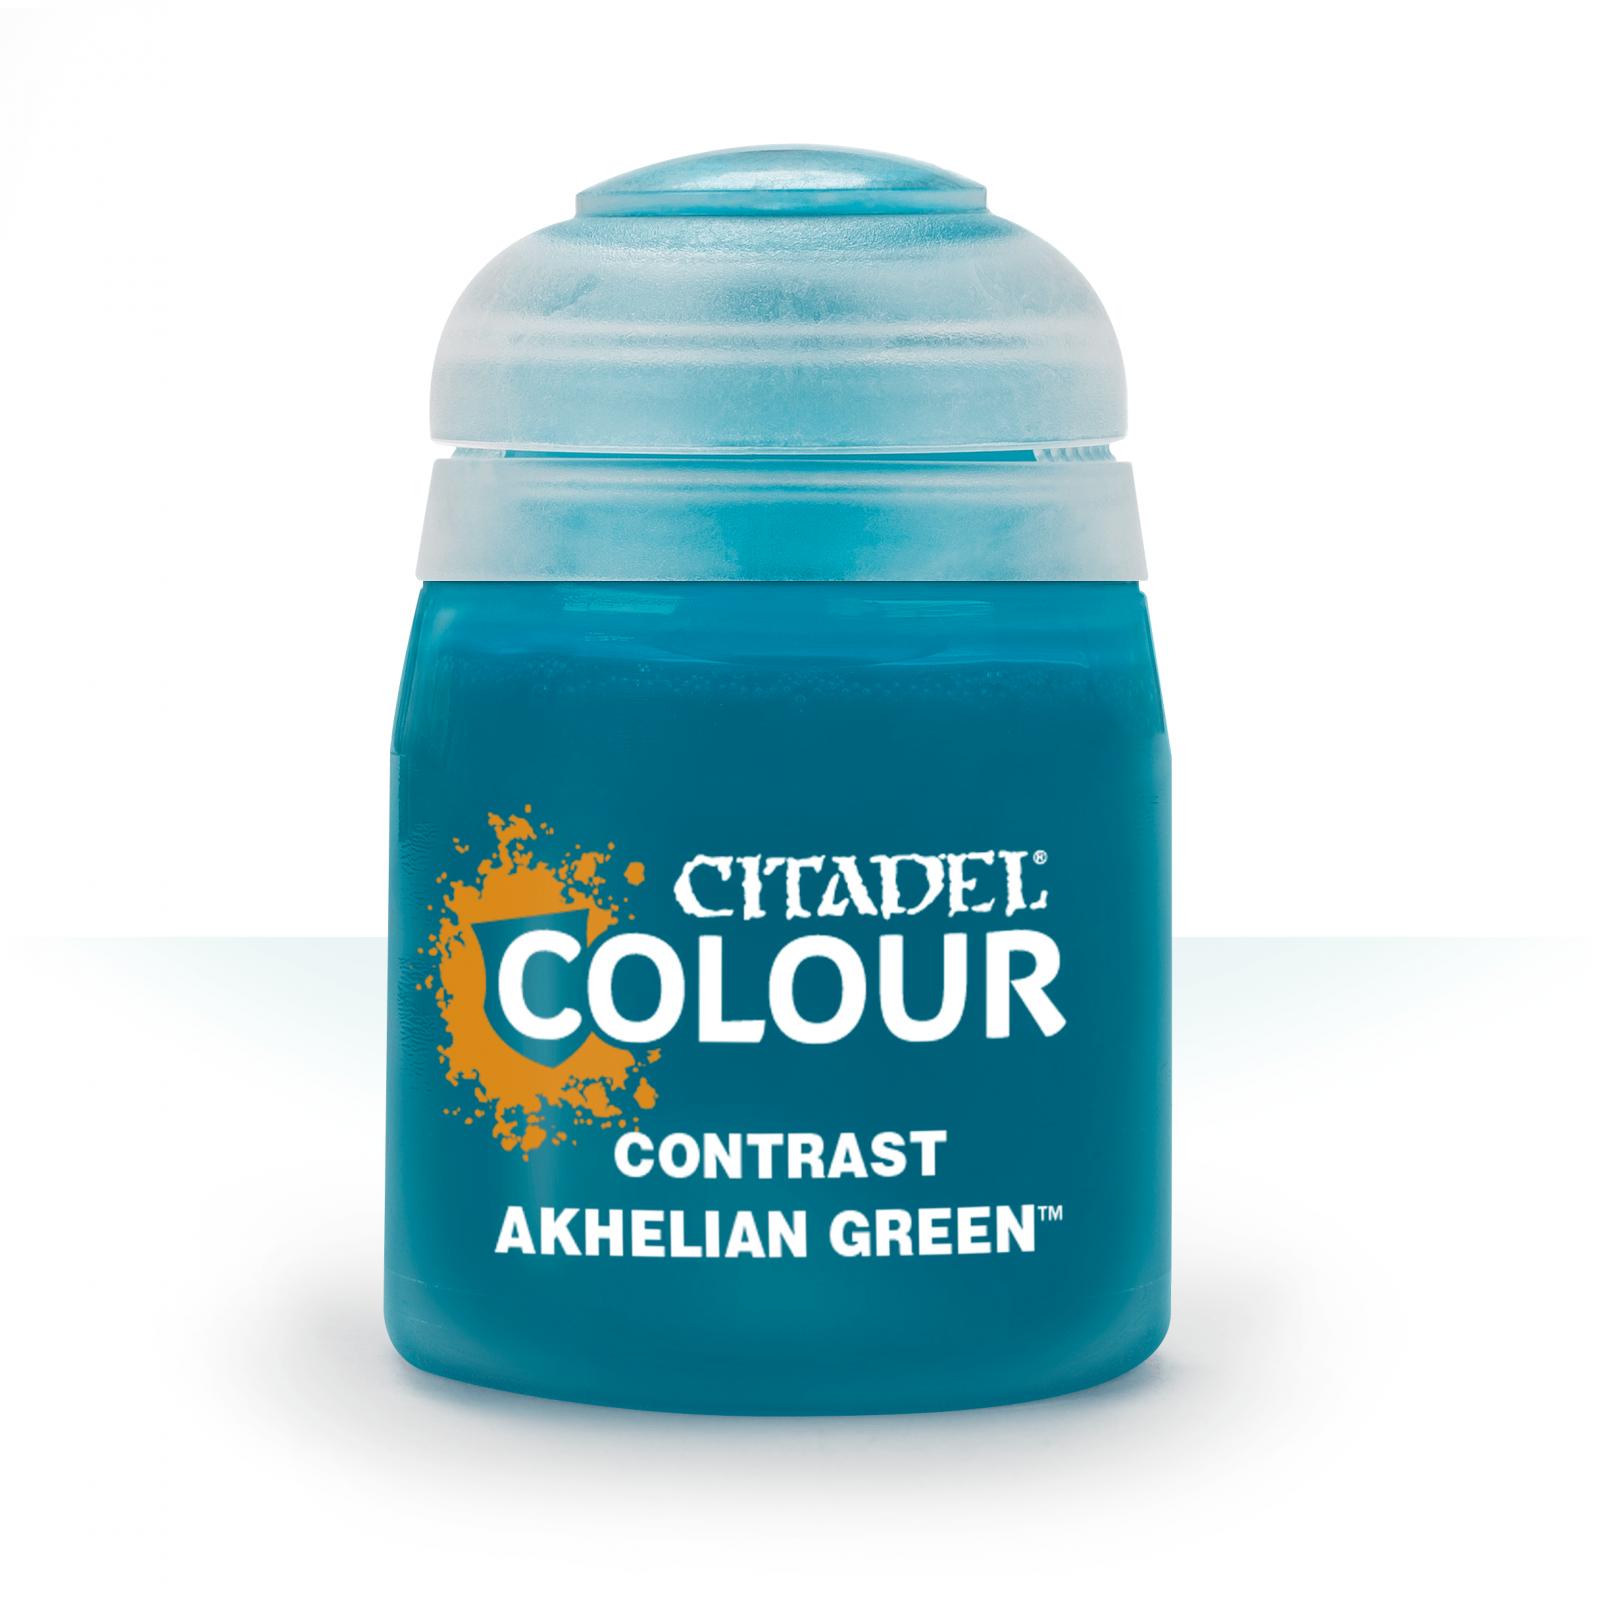 Akhelian Green Citadel Contrast Paint